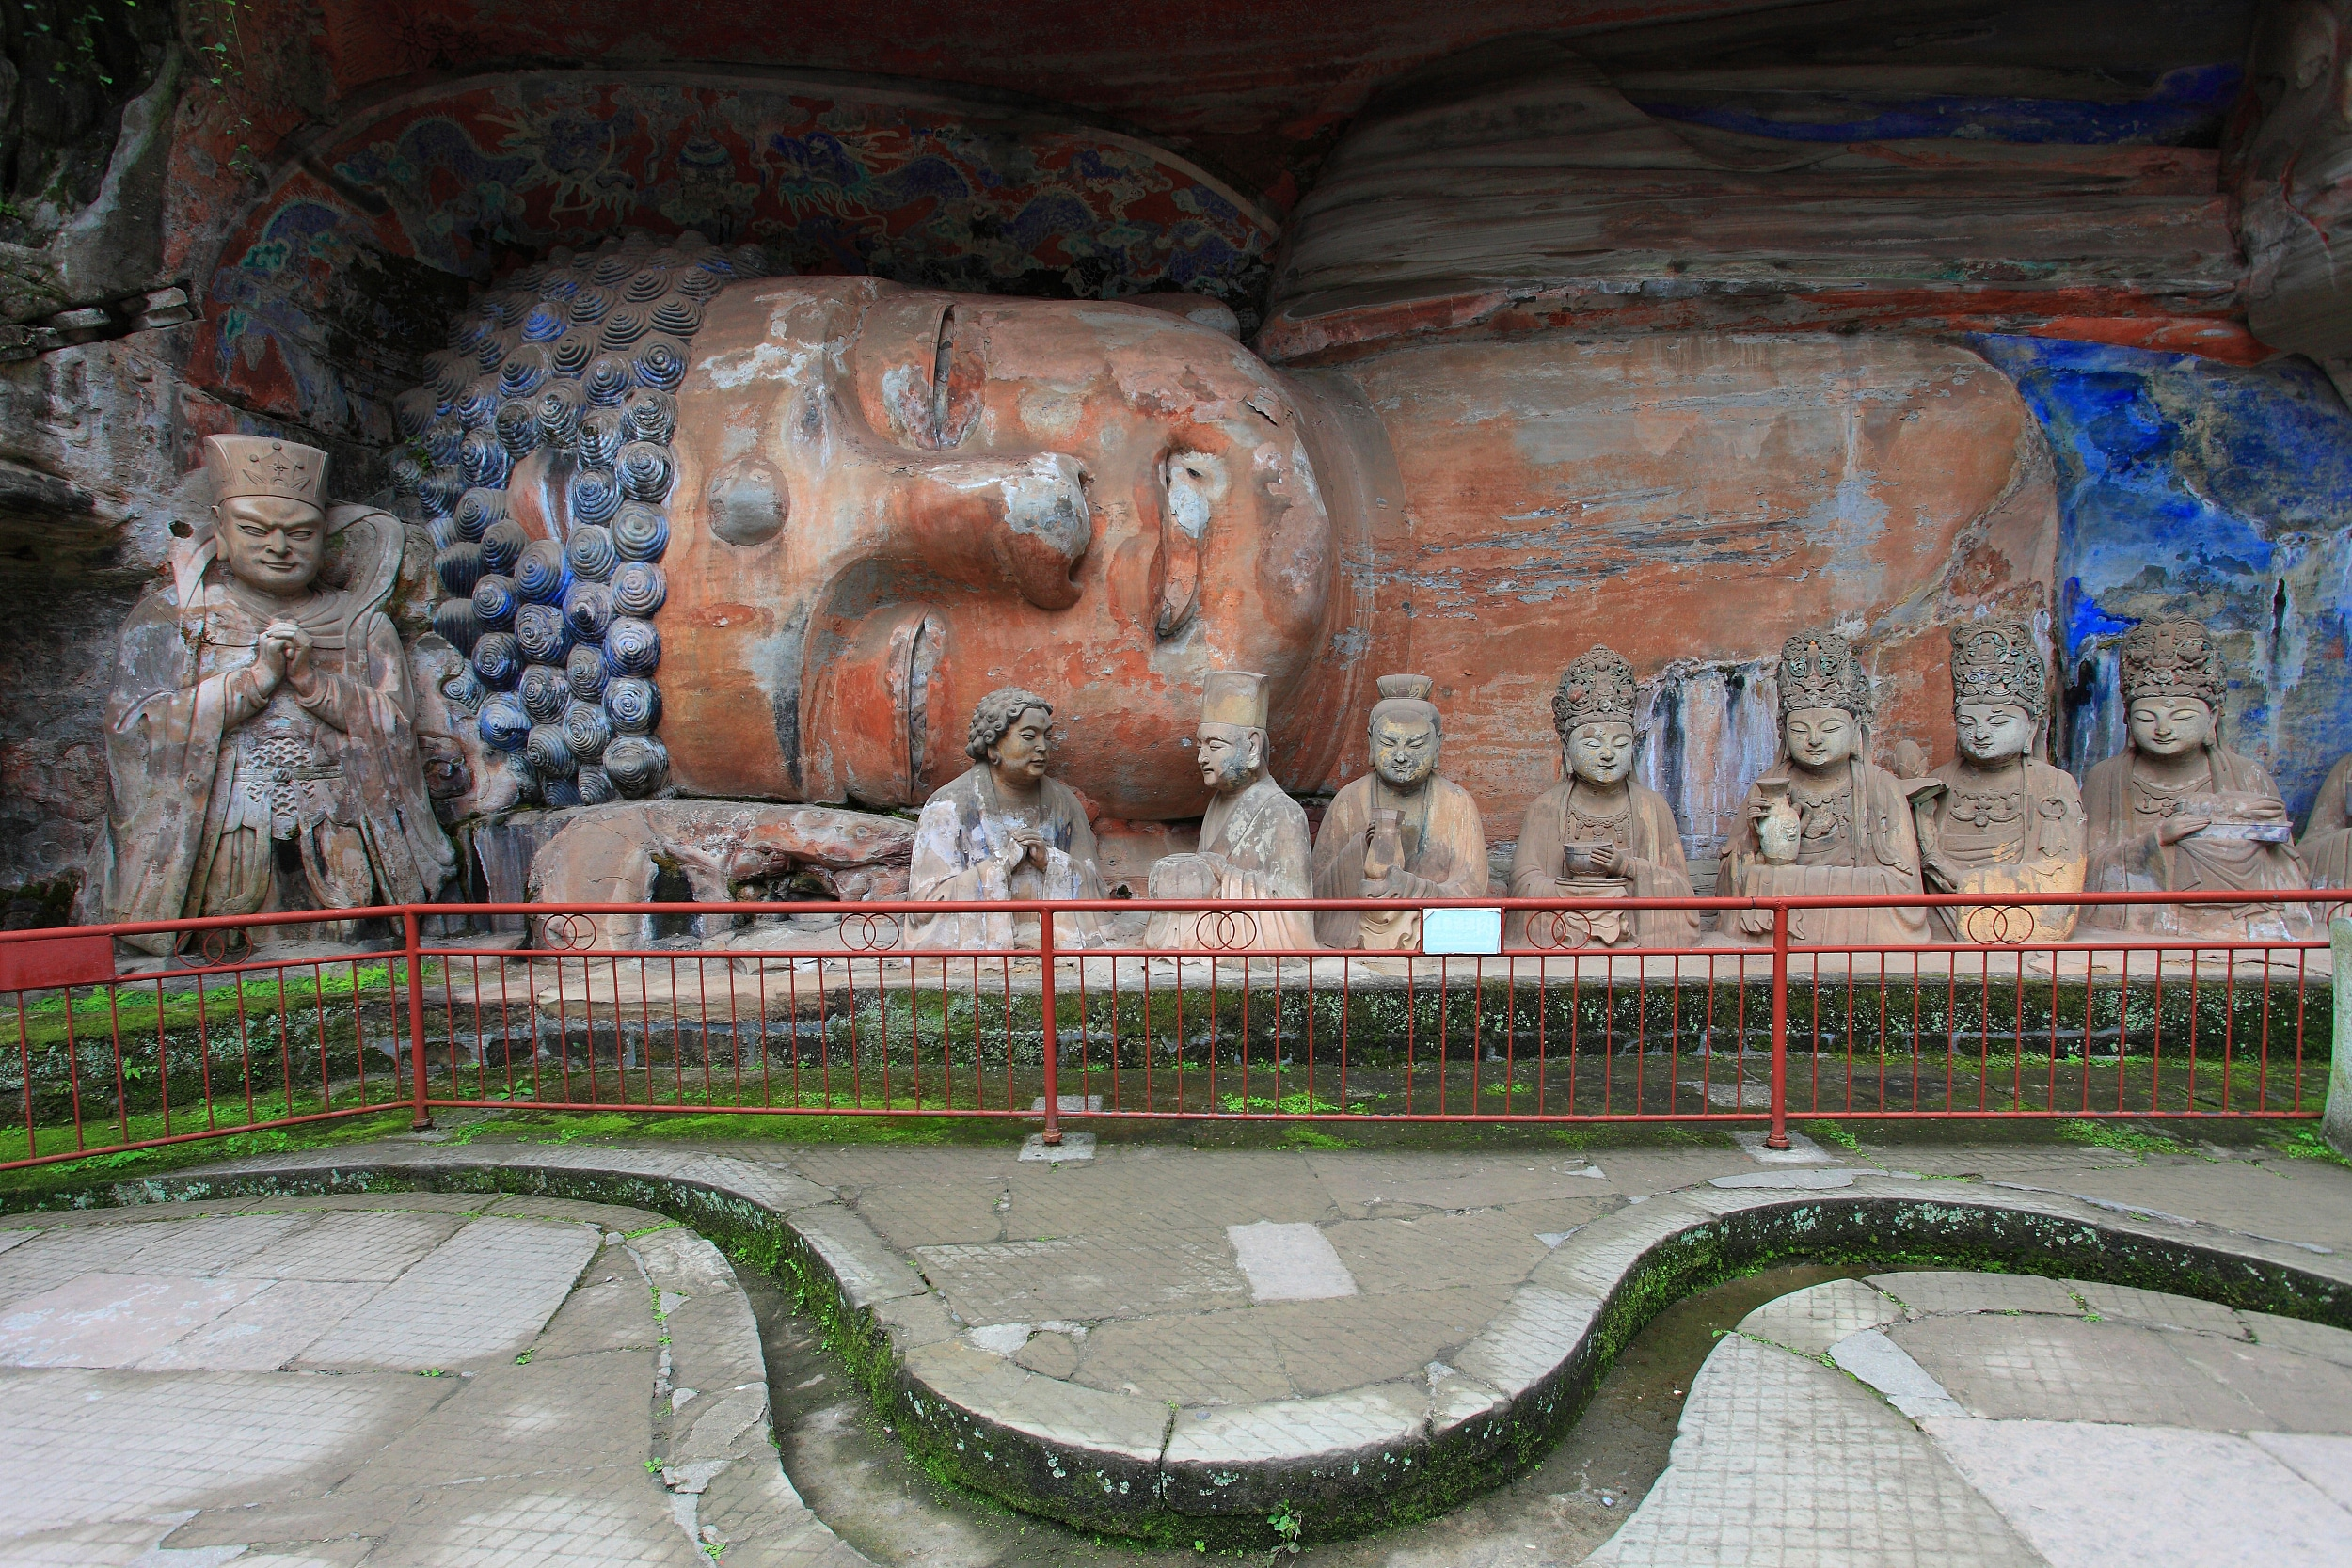 Chongqing Dazu Rock Carvings Exploring Tour